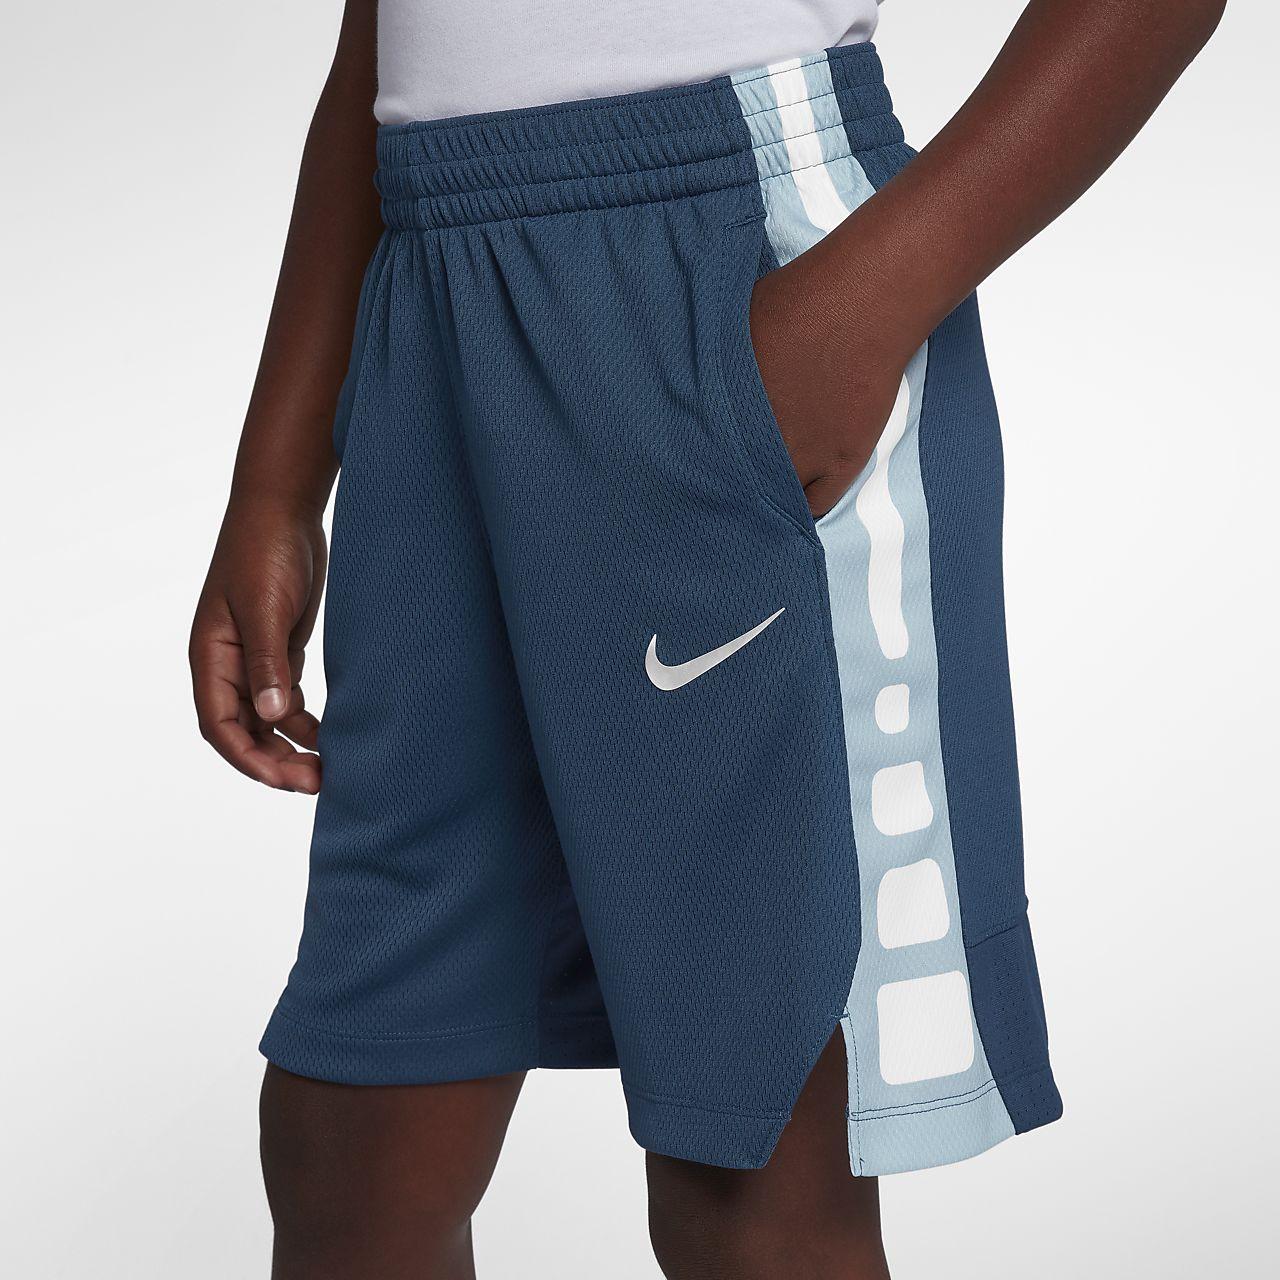 ad3a0b649f81 Nike Dri-FIT Elite Big Kids  (Boys ) Basketball Shorts. Nike.com